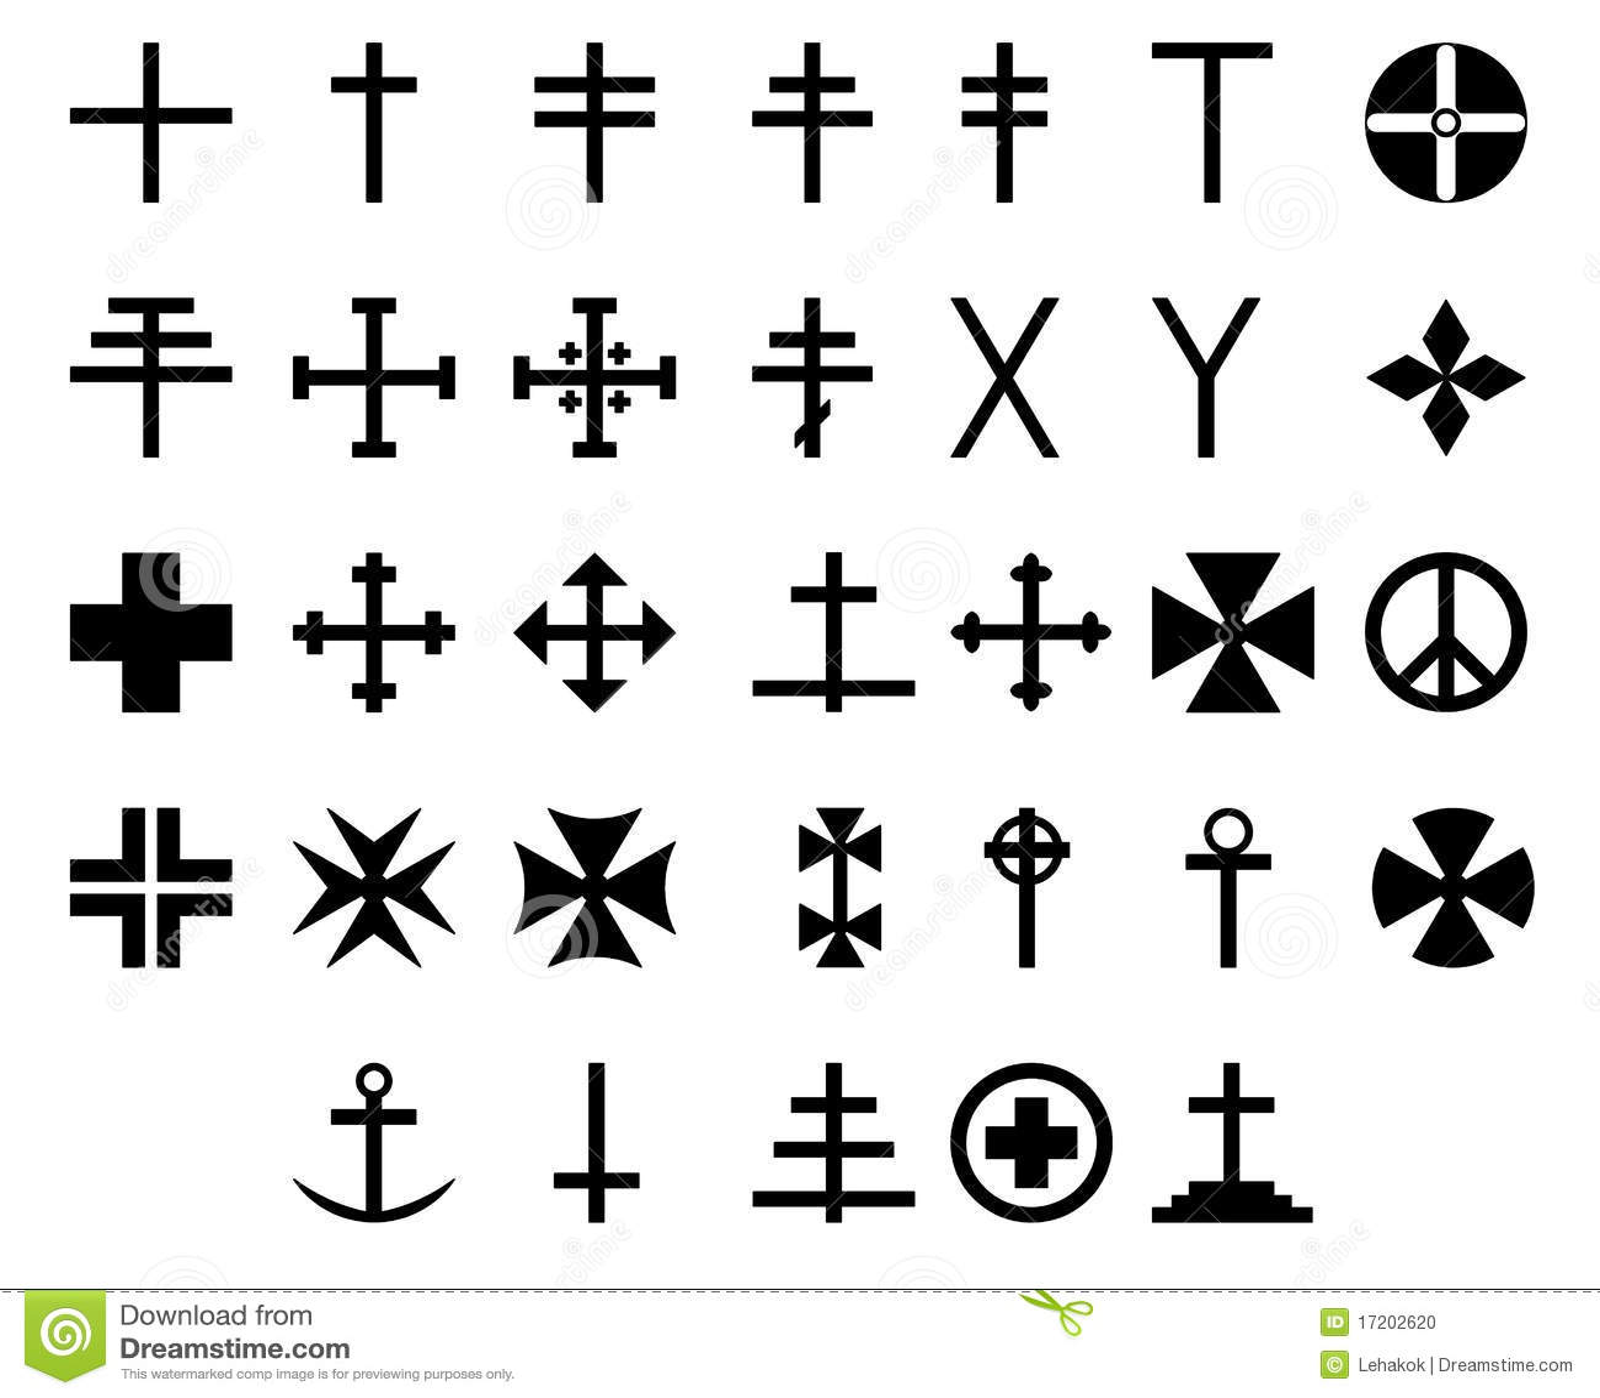 33 cross symbols stock illustration illustration of illustration royalty free stock photo buycottarizona Image collections